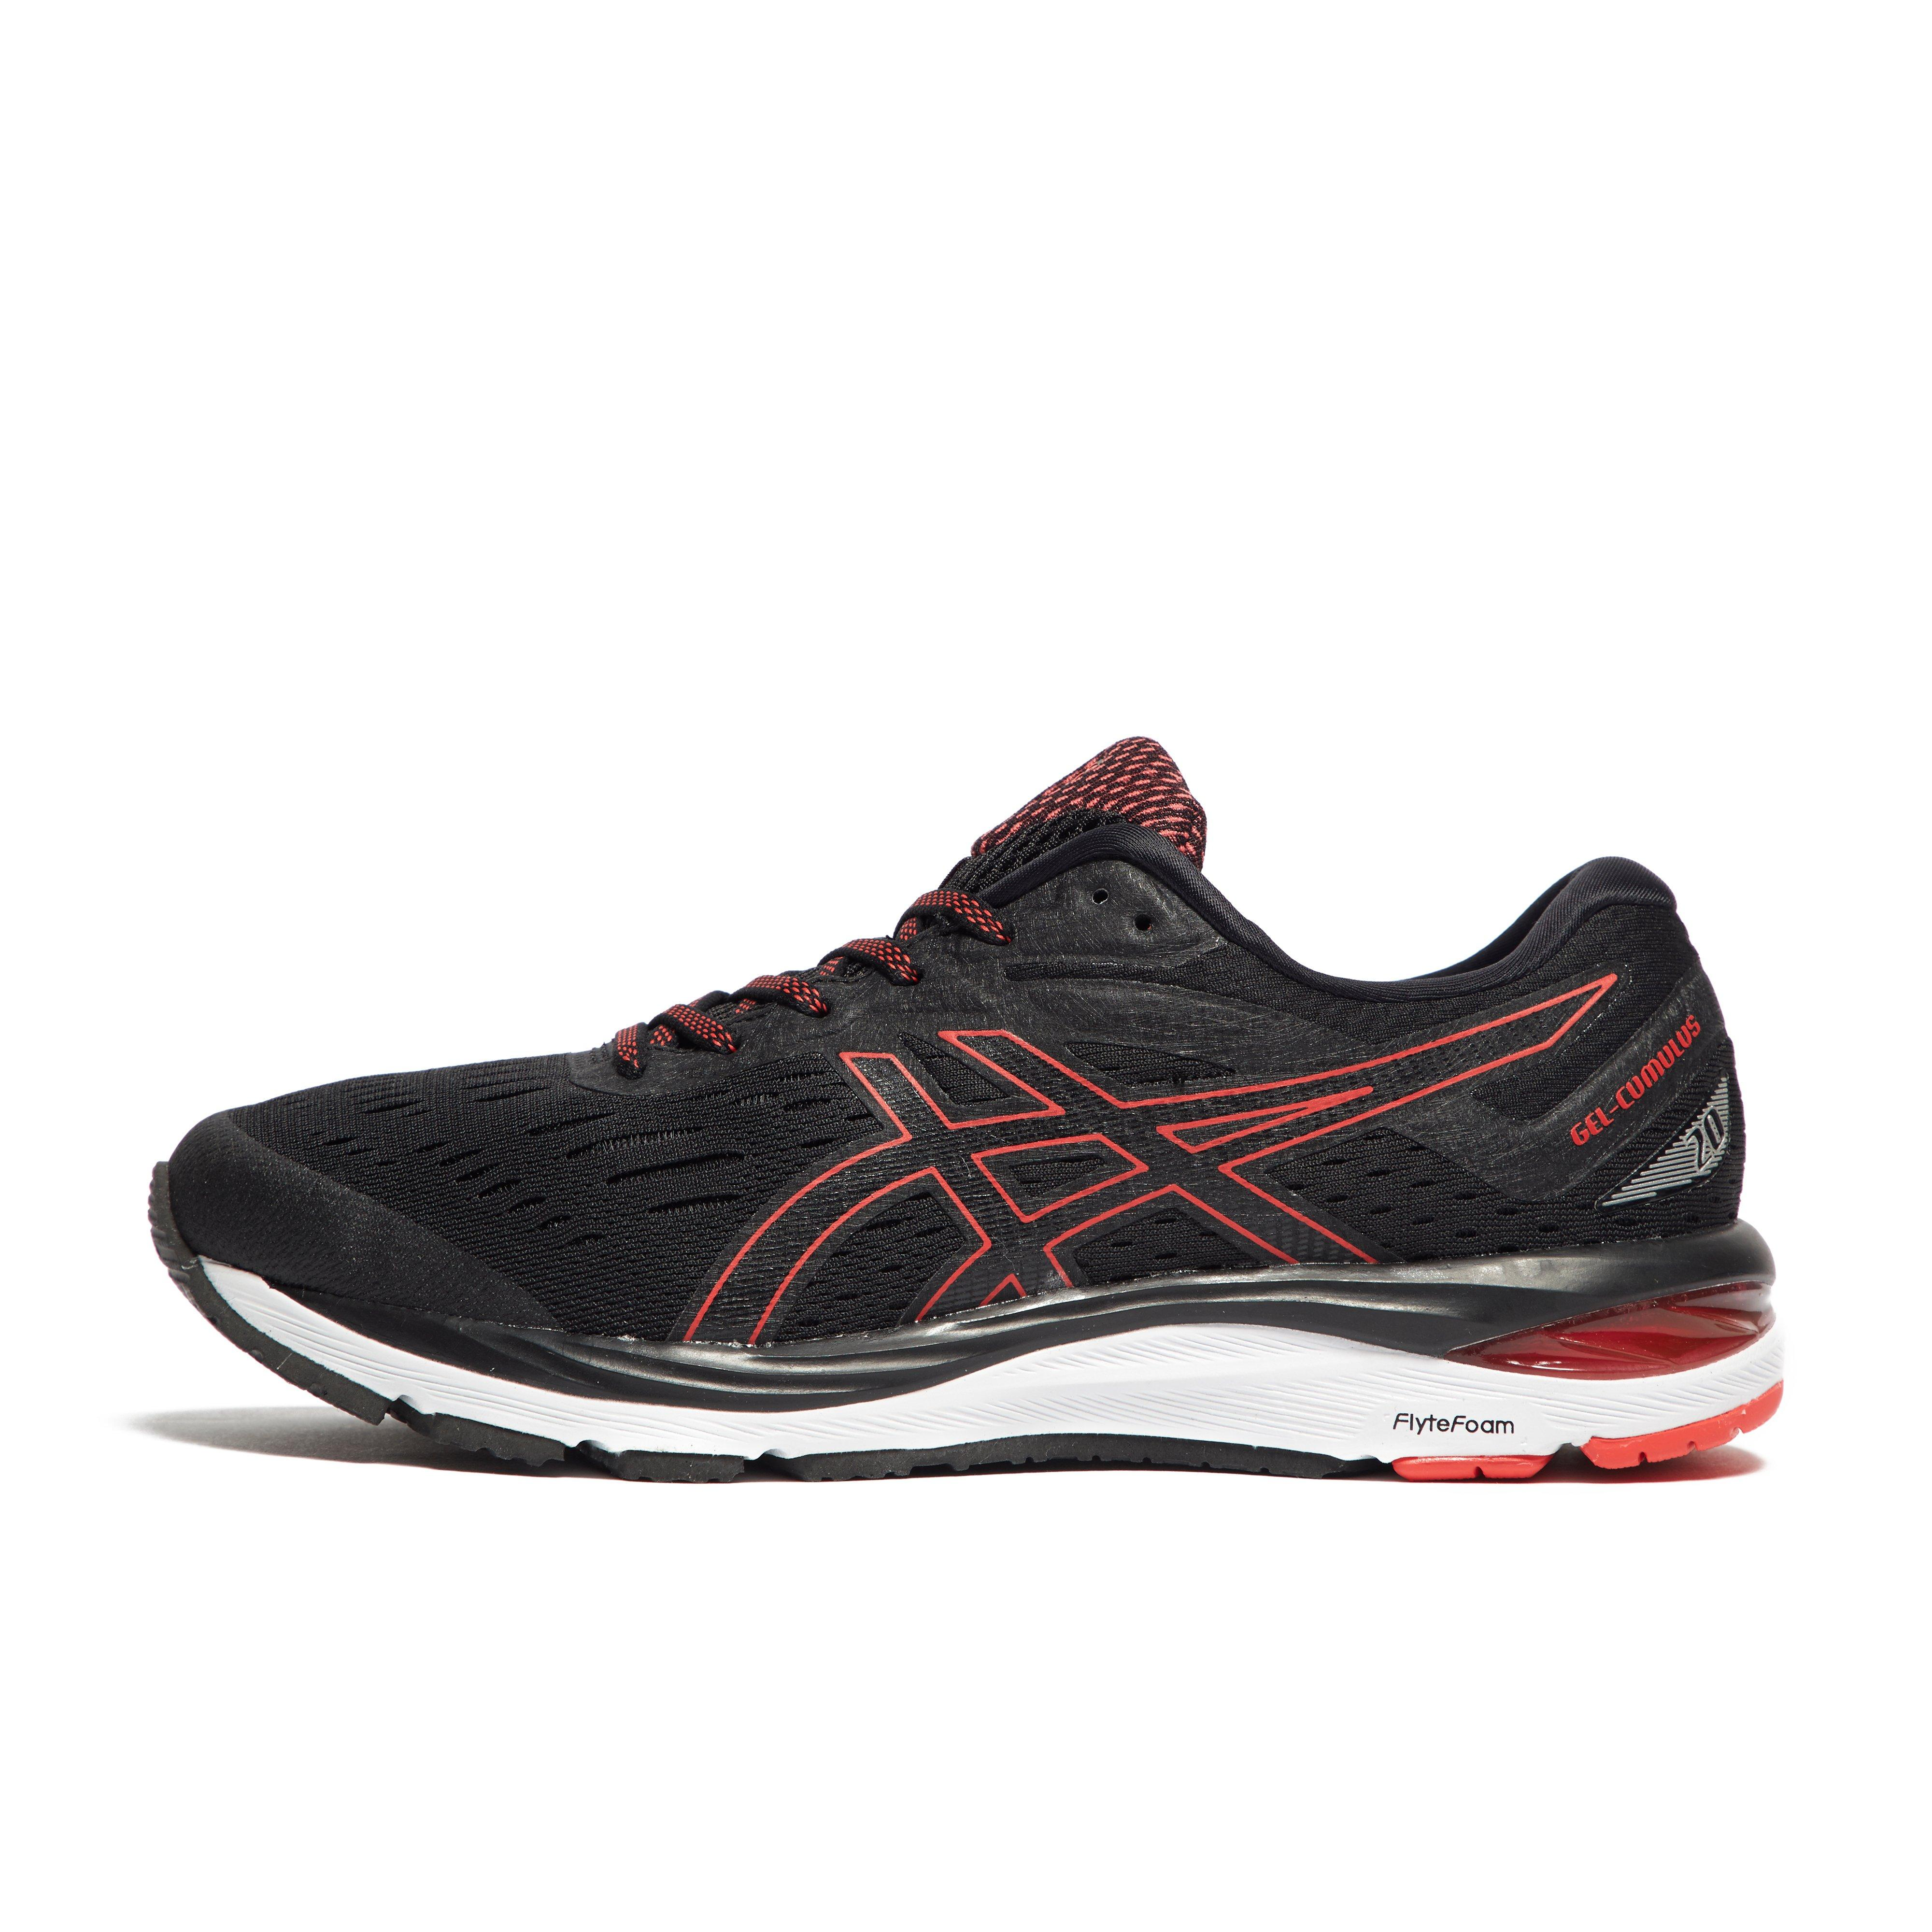 Details about Asics Gel-Cumulus 20 GTX Men's Running Shoes